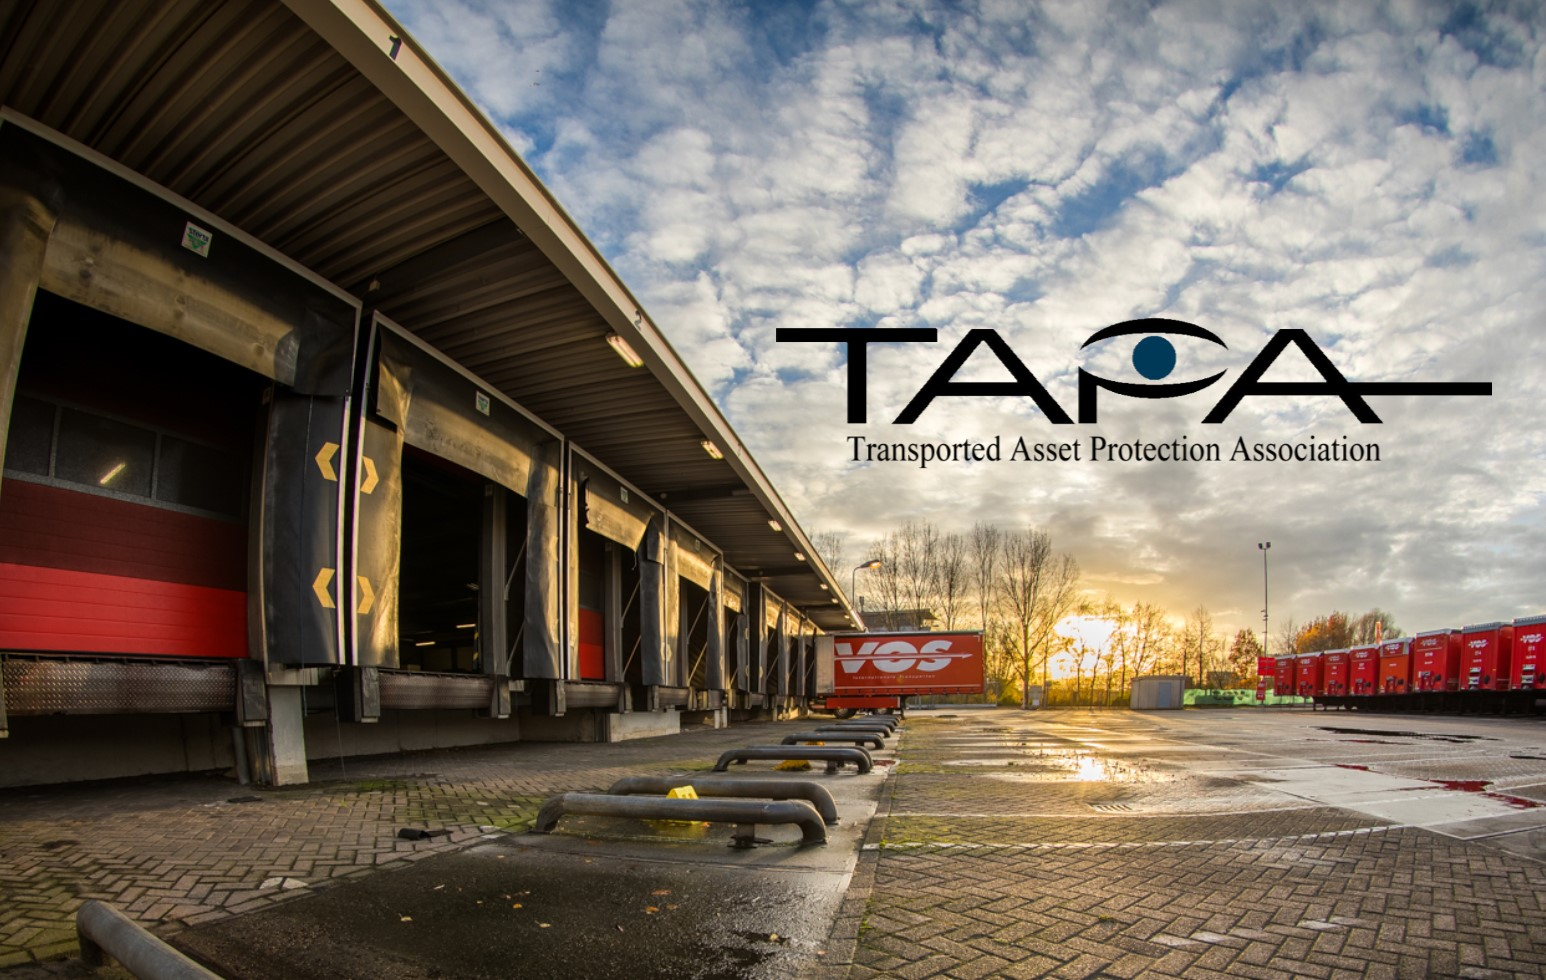 Tapa transport asset protection association